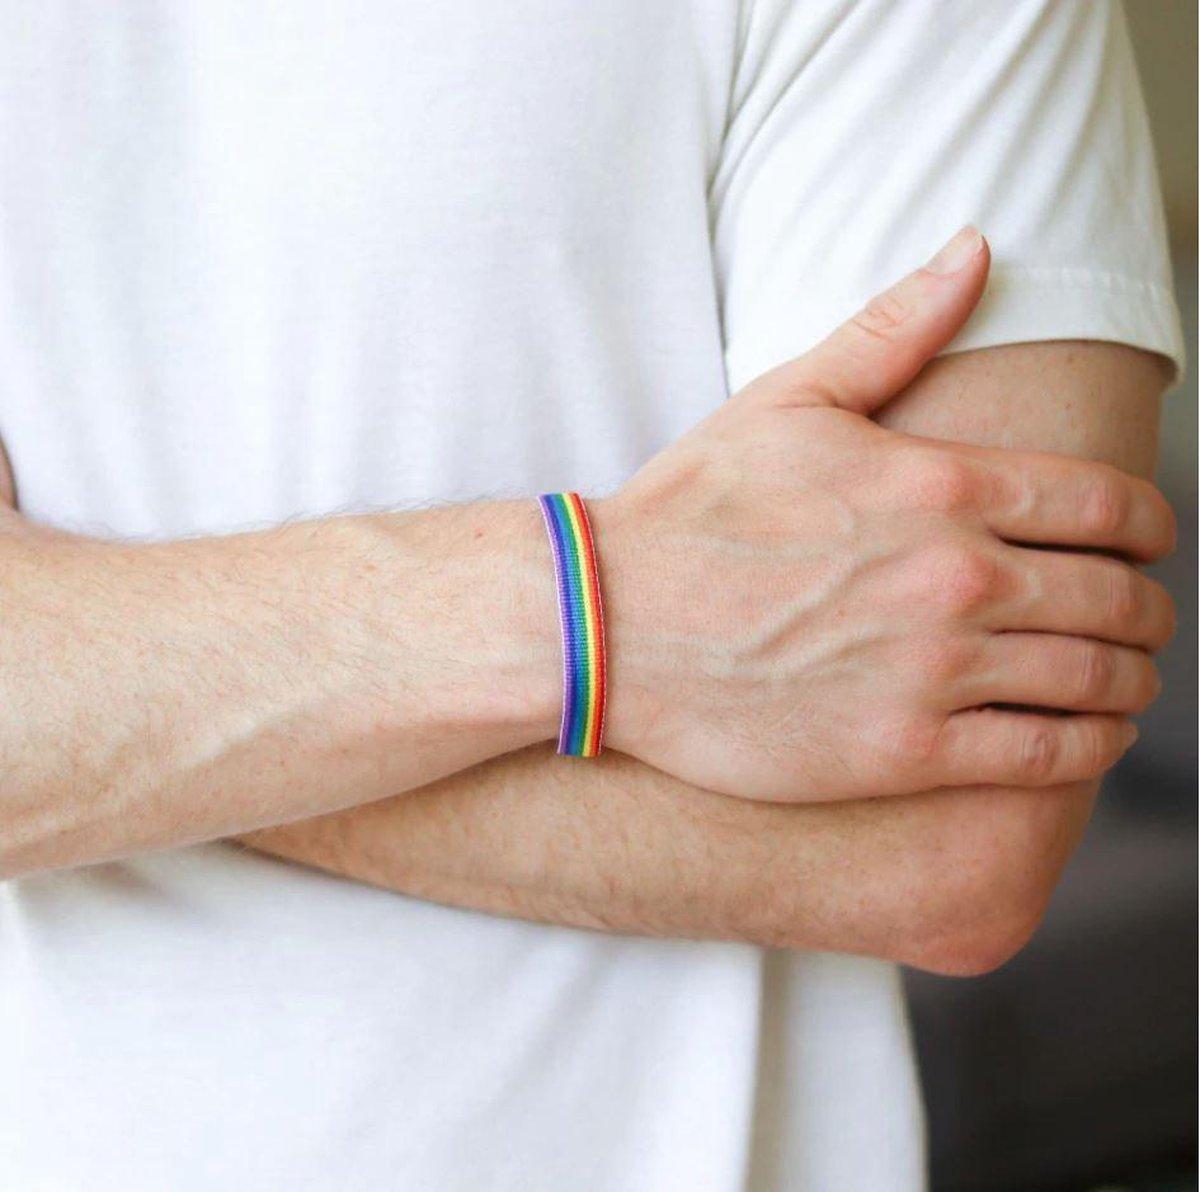 Pride armband - LGBTQ - Regenboog - 23 cm - 1 stuks